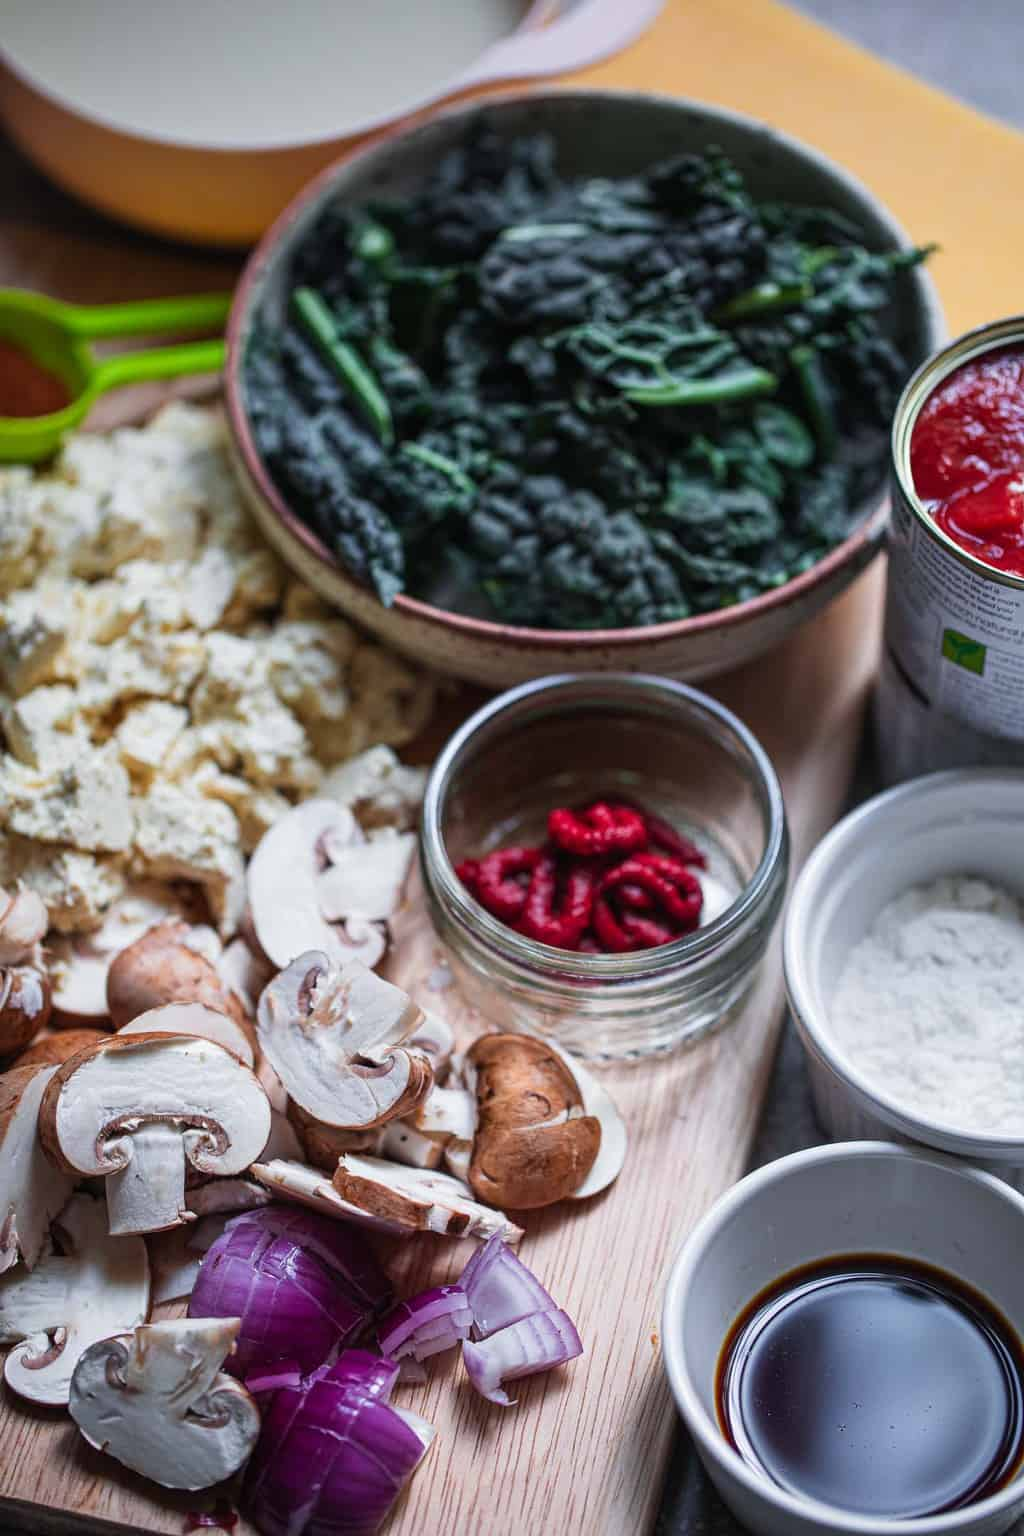 Ingredients for a gluten-free vegan lasagna